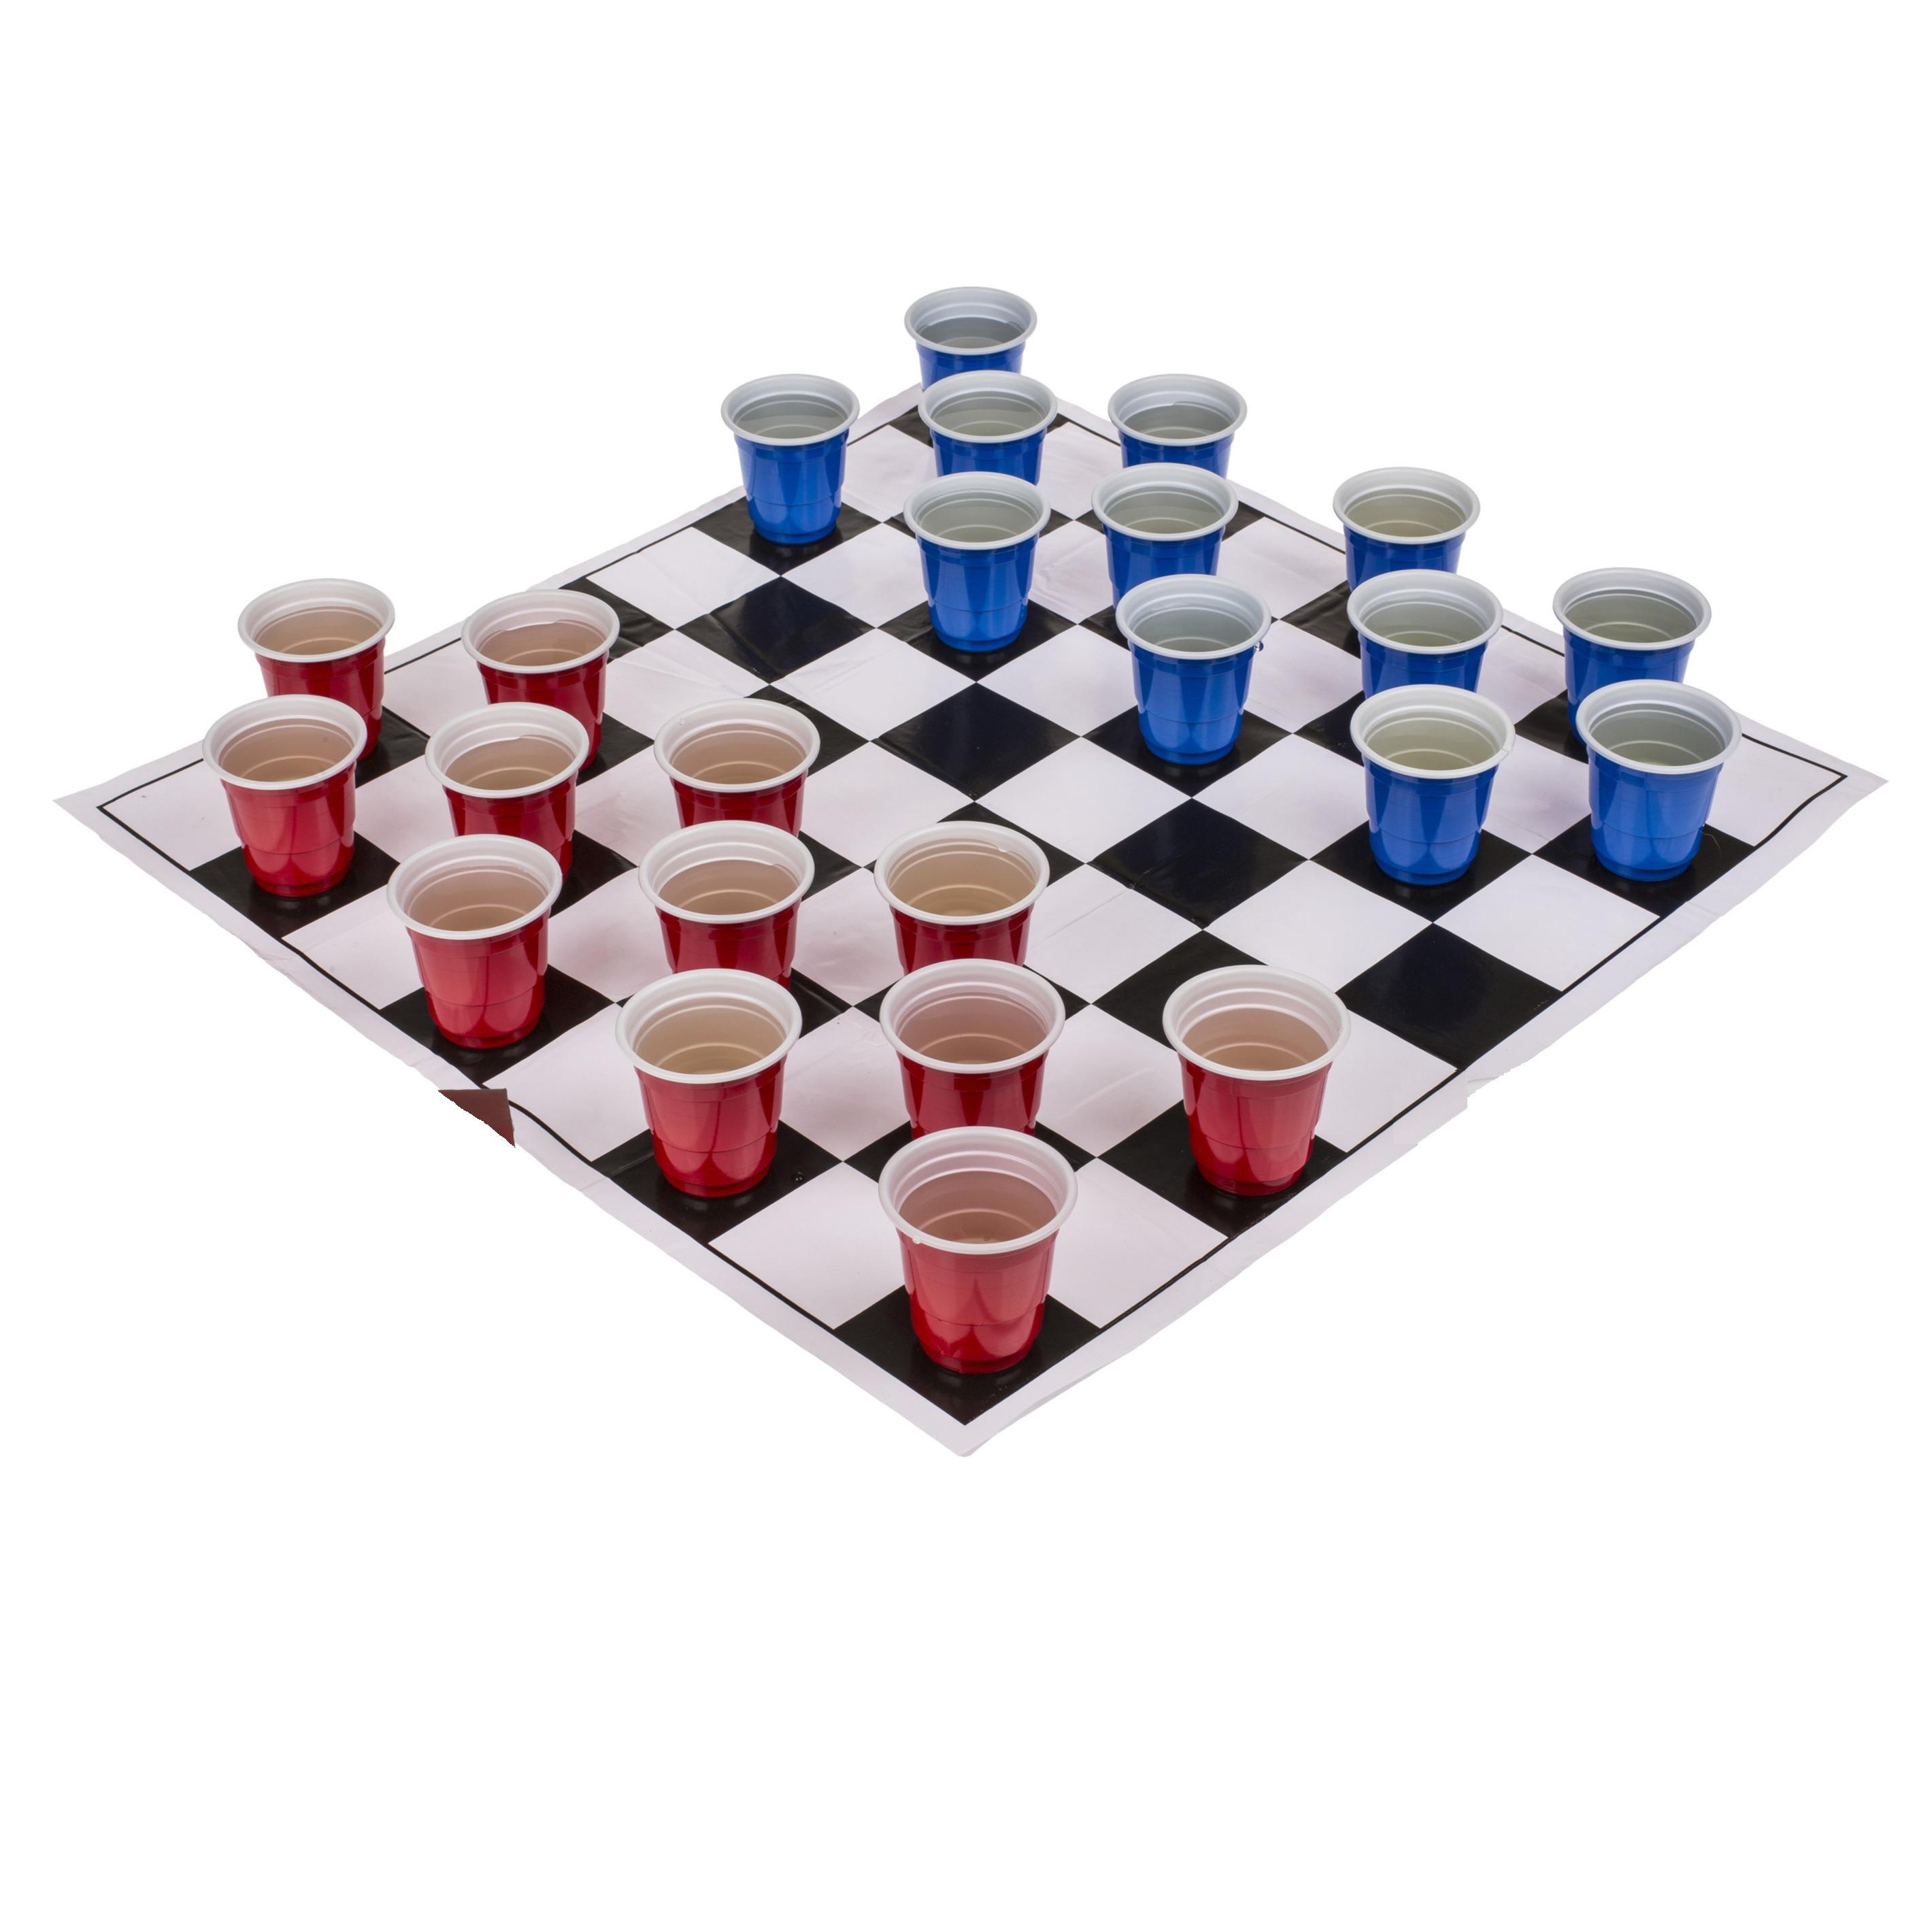 Drankspel-drinkspel shotjes dammen met 24 bekertjes